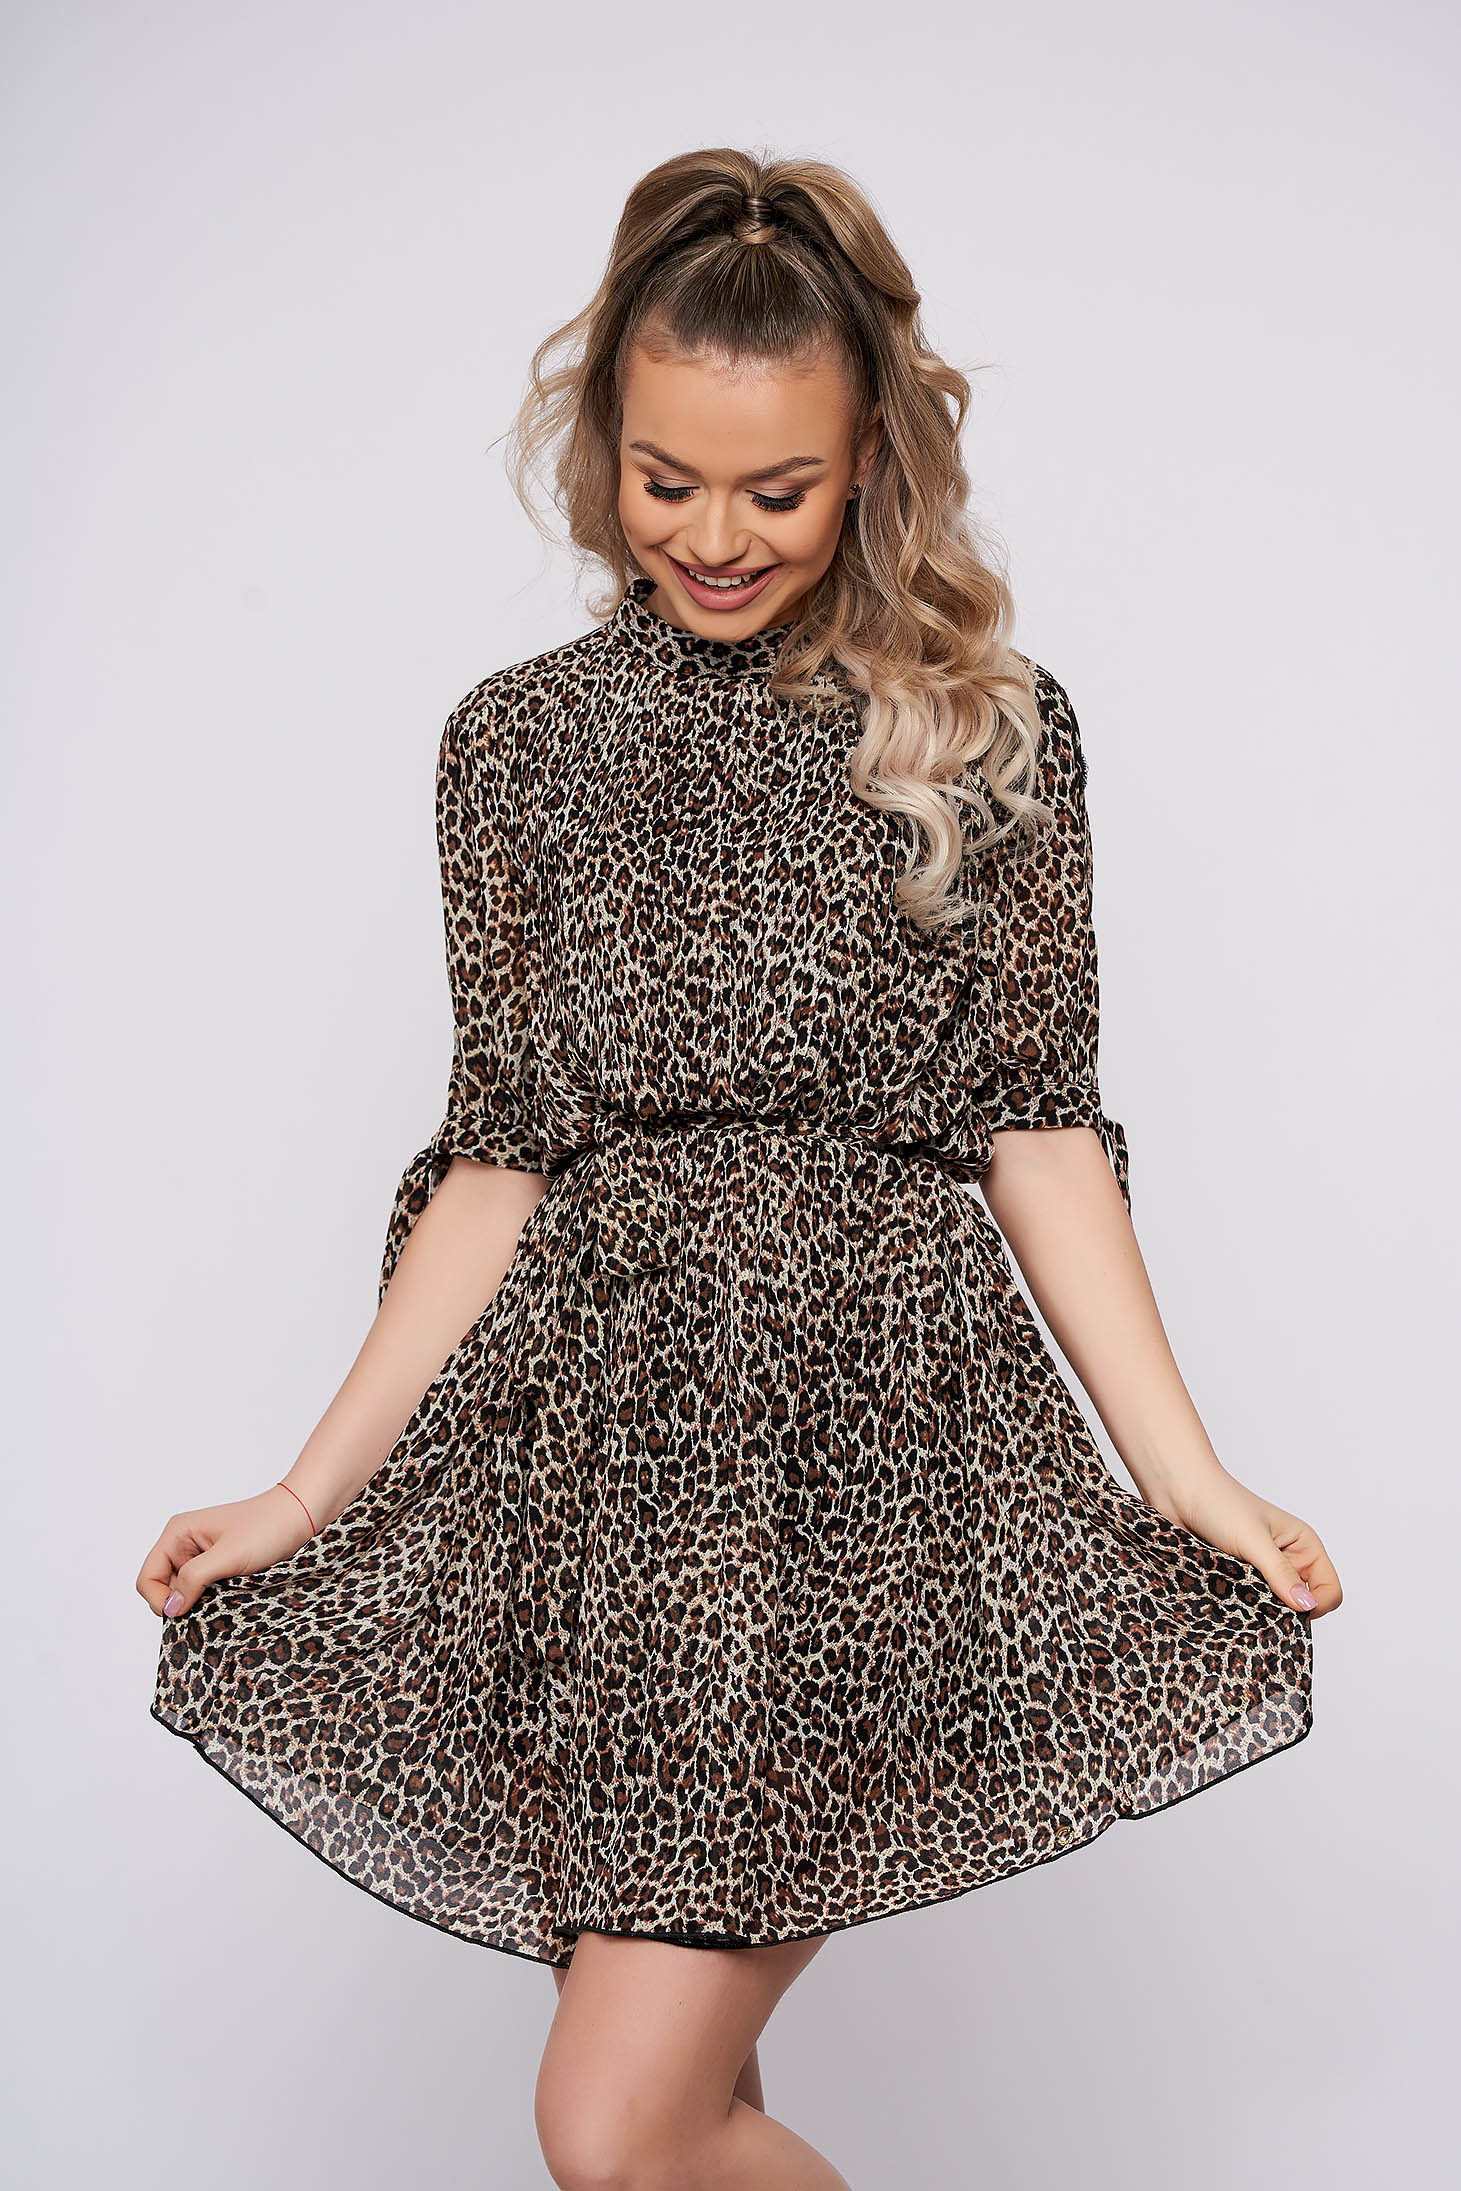 Peach casual short cut dress from veil fabric animal print